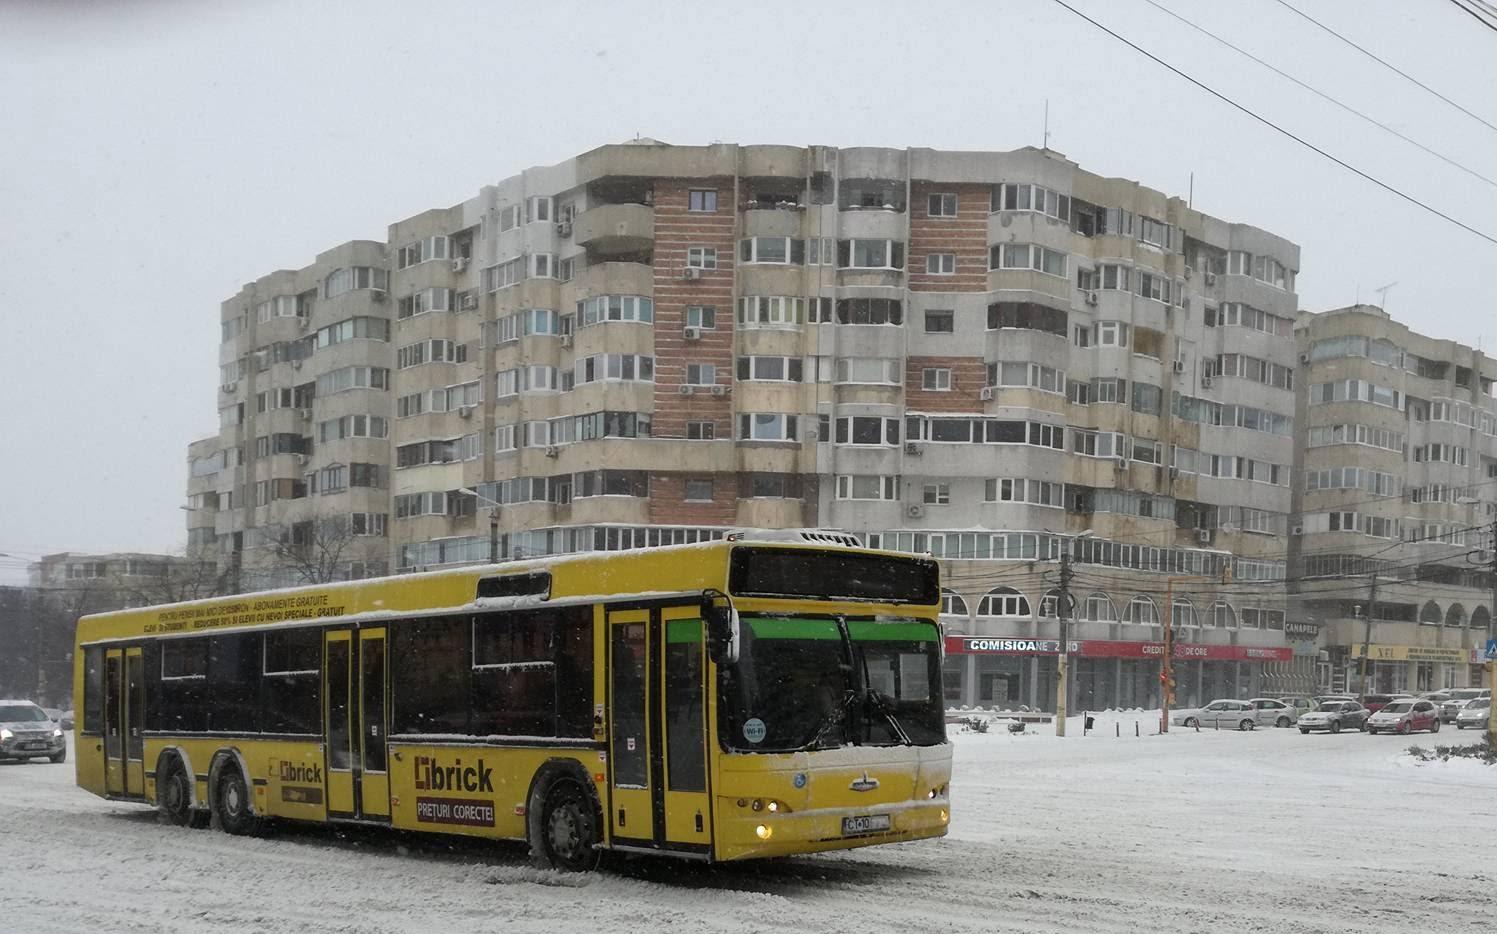 ratc iarna 1